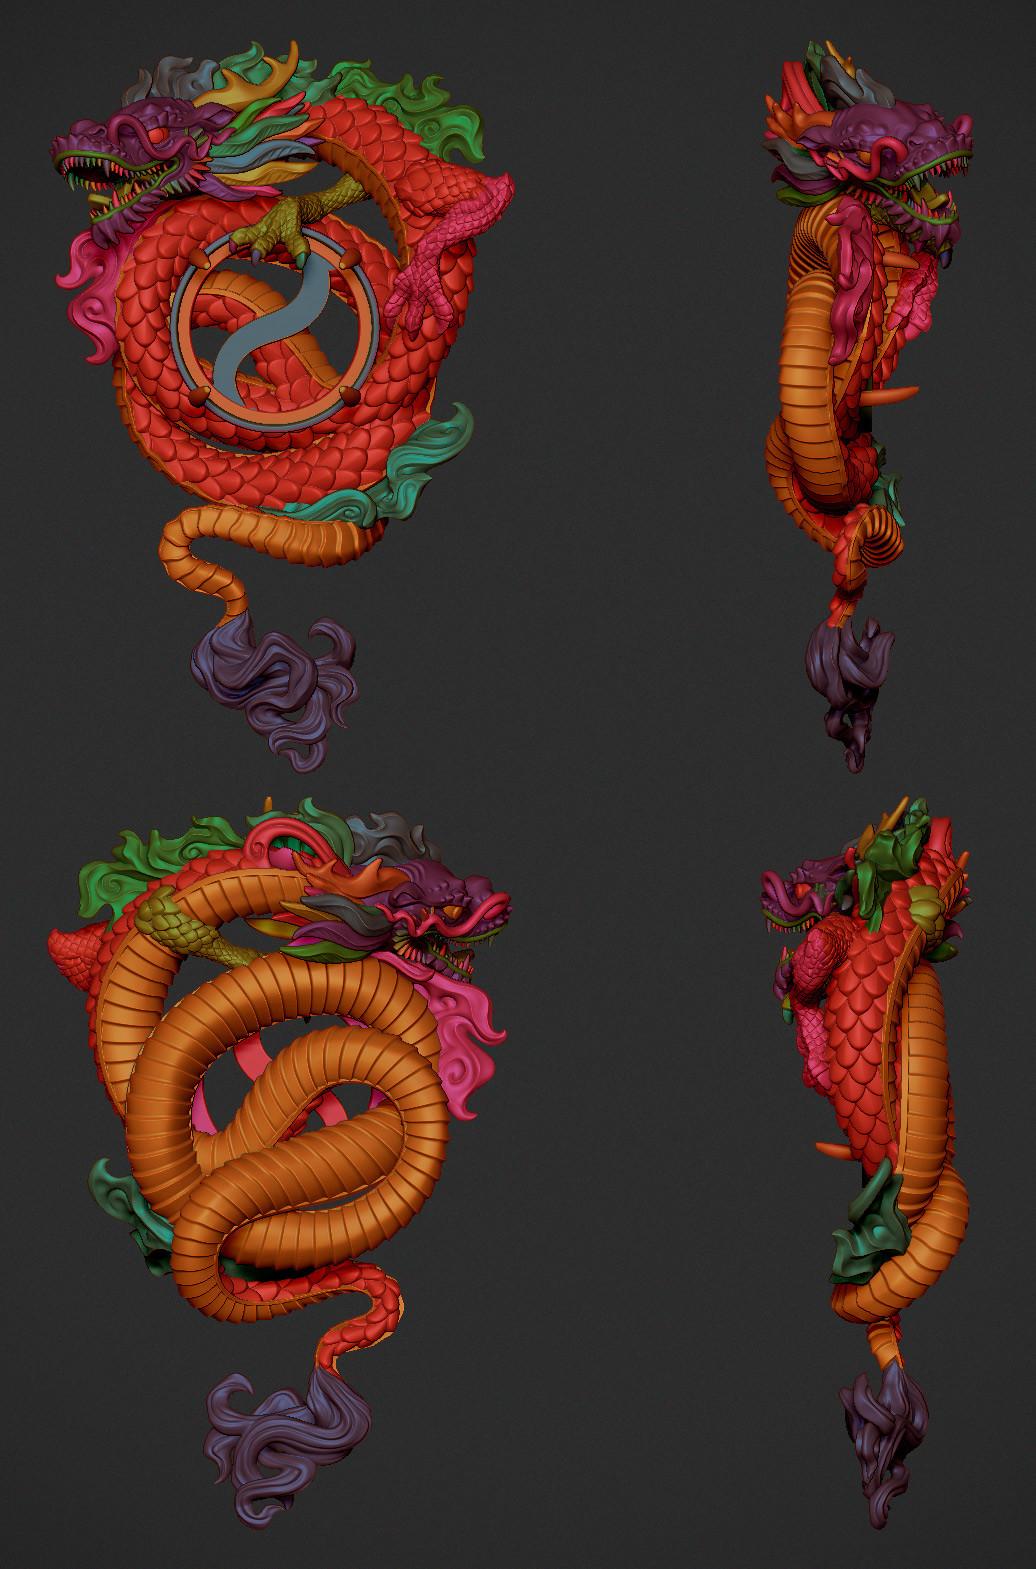 Nacho riesco gostanza colgante dragon y jade zbr2